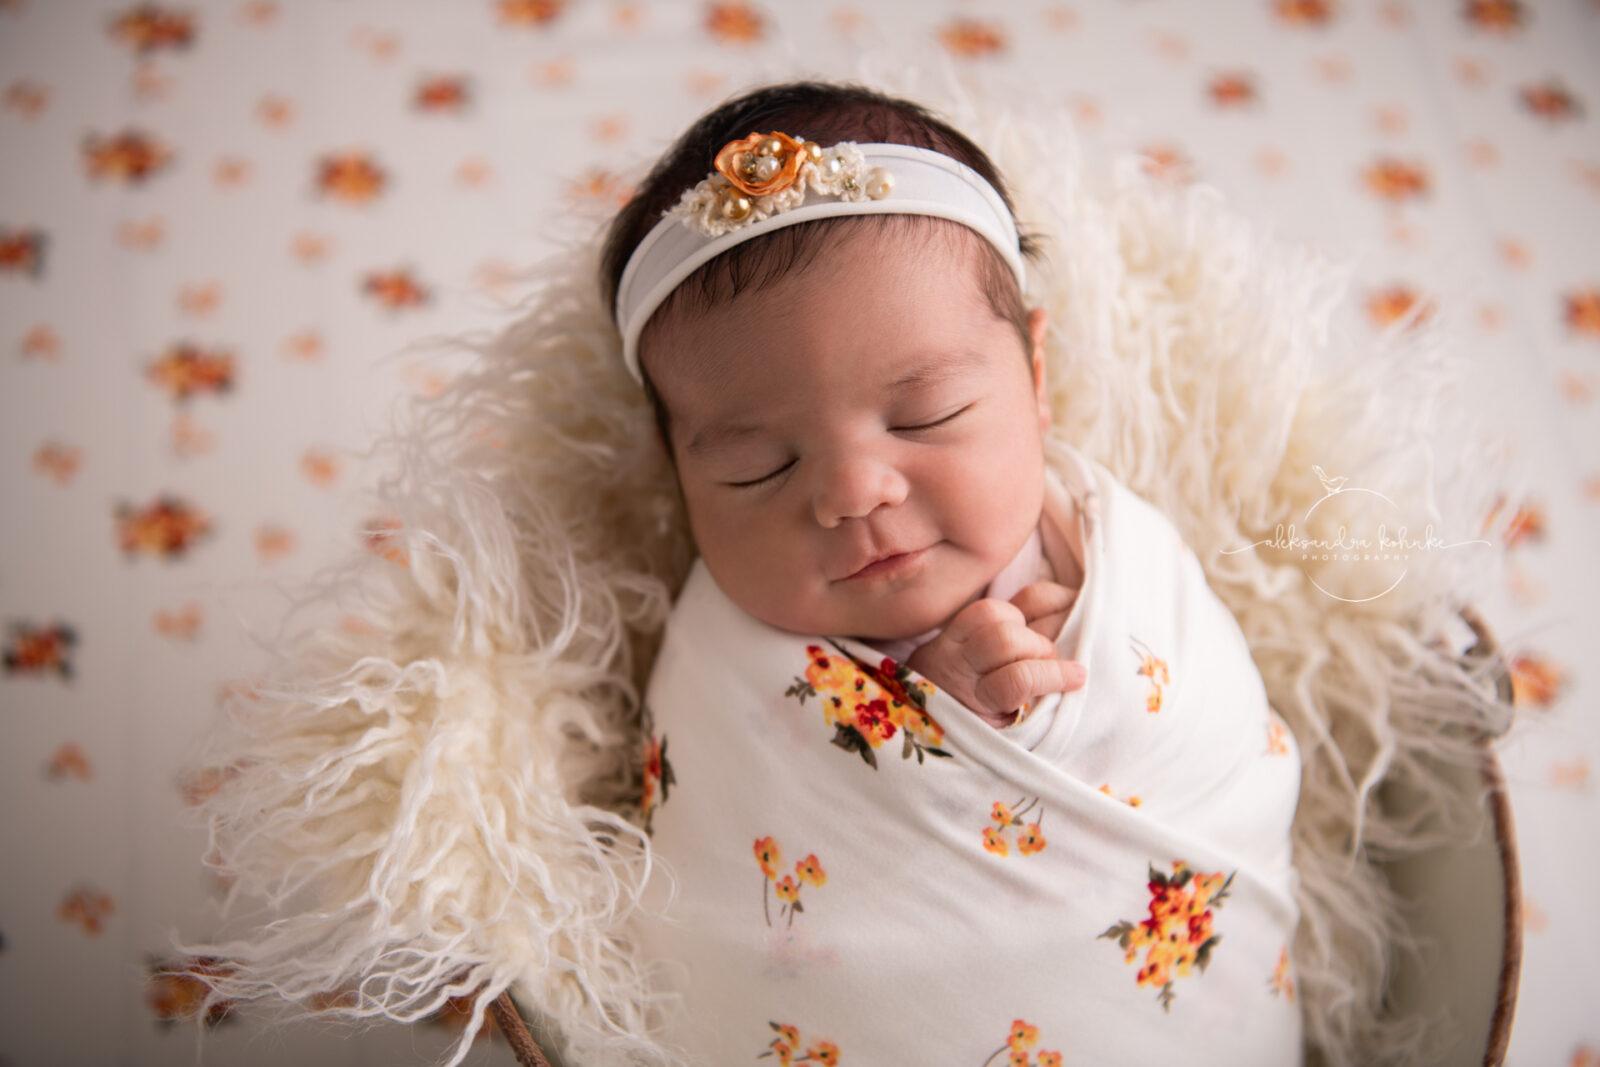 Fotograf in Rapperswil Jona für Neugeborene und Familienshootings